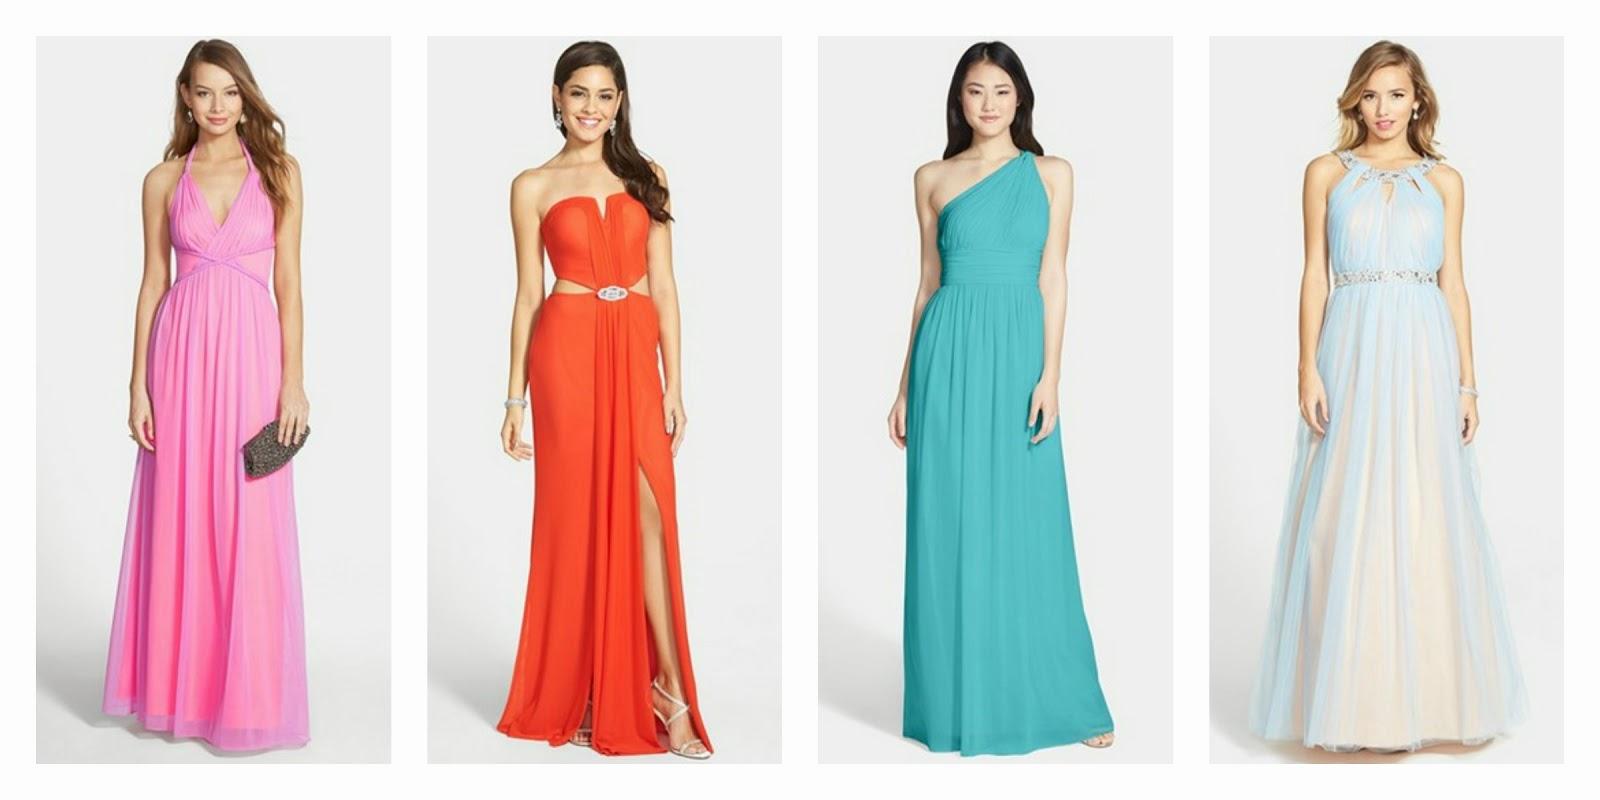 prom dresses under $150